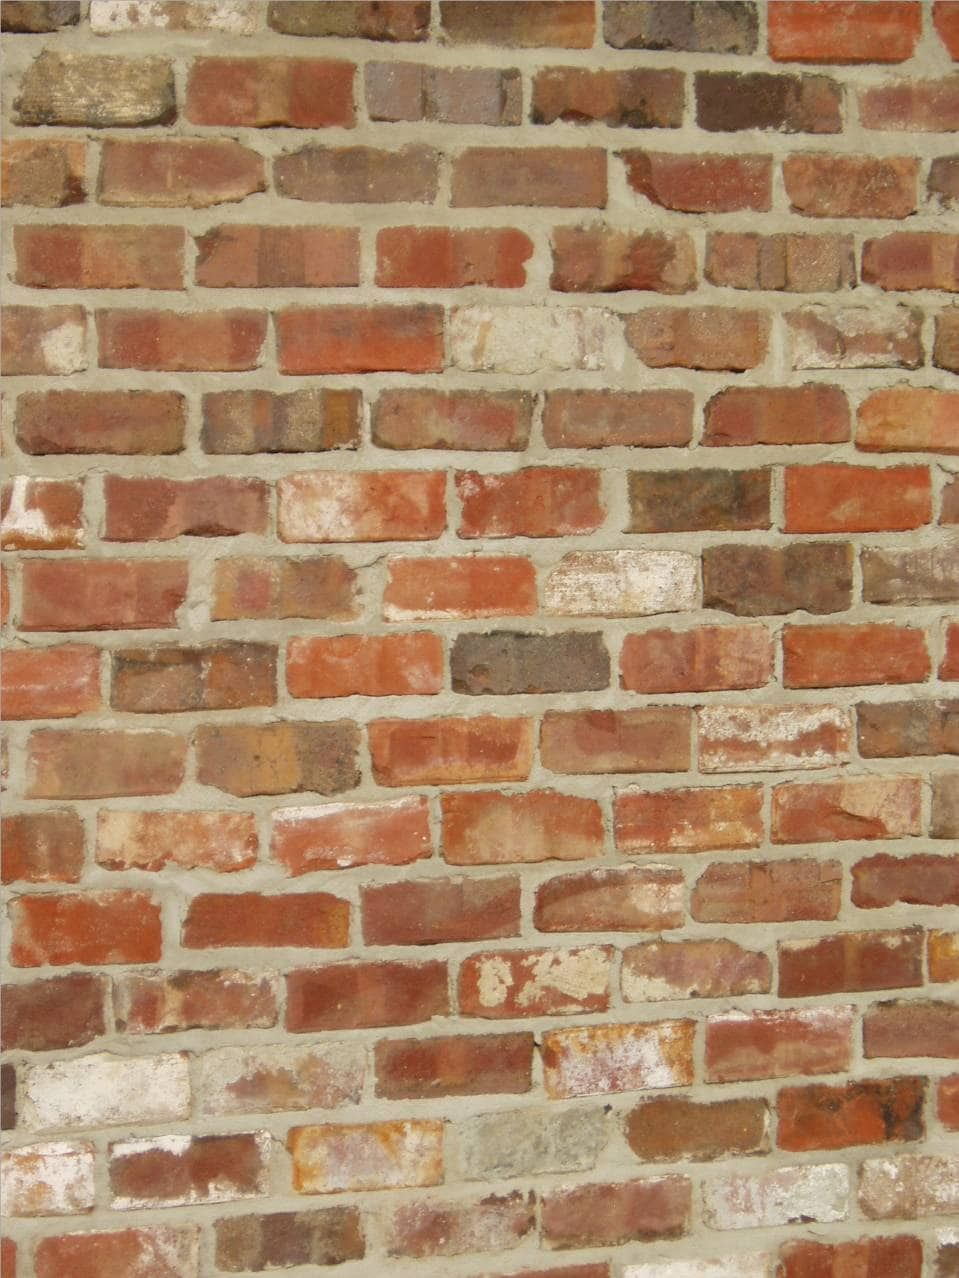 Reclaimed Building Brick Salvaged Antique Brick For Sale Antique Brick Brick Bricks For Sale